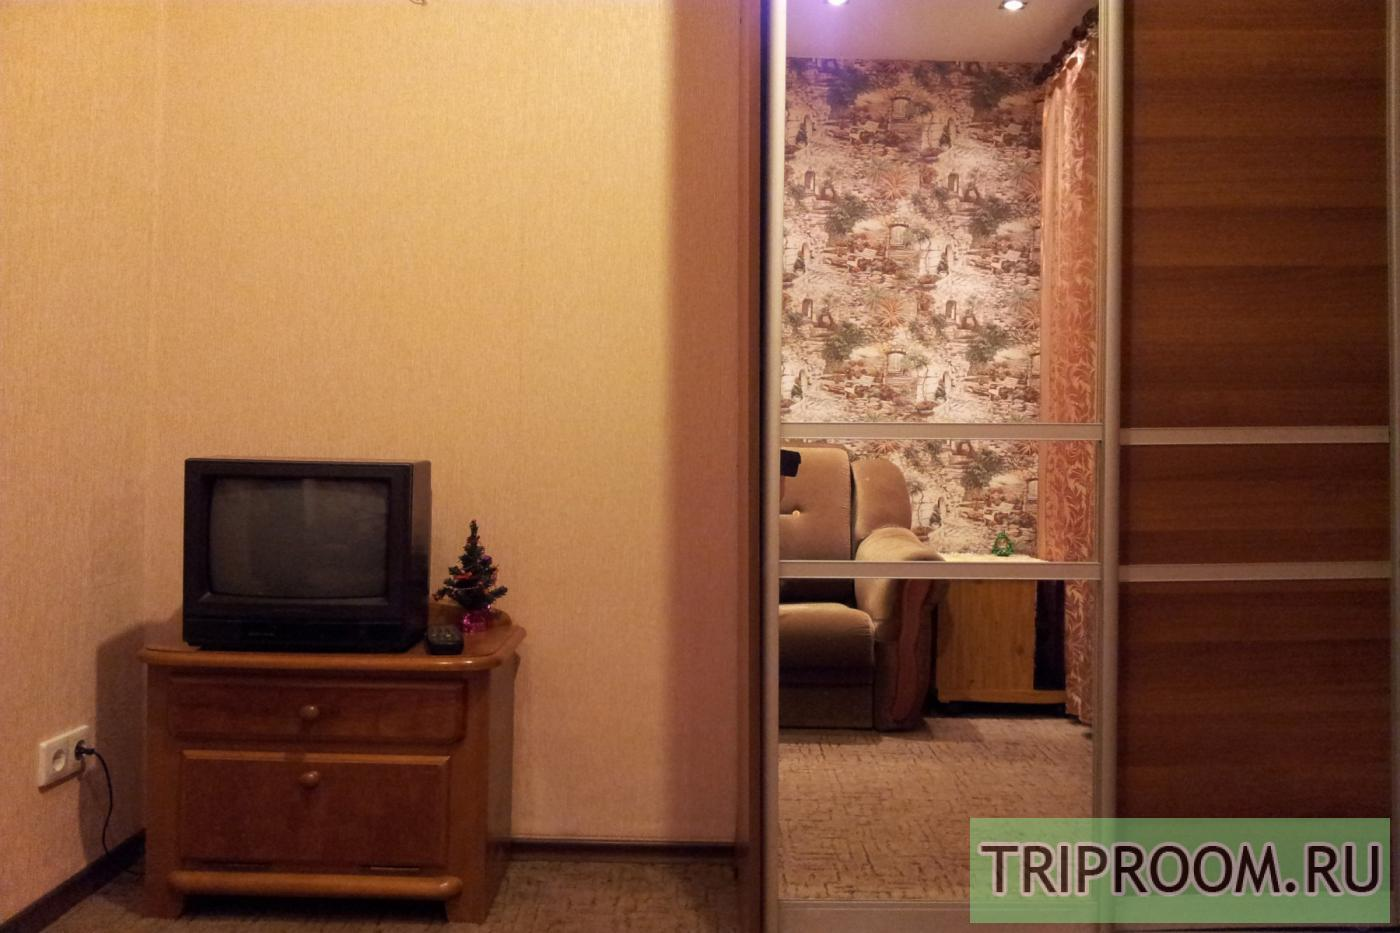 1-комнатная квартира посуточно (вариант № 30855), ул. Кузнецова улица, фото № 3